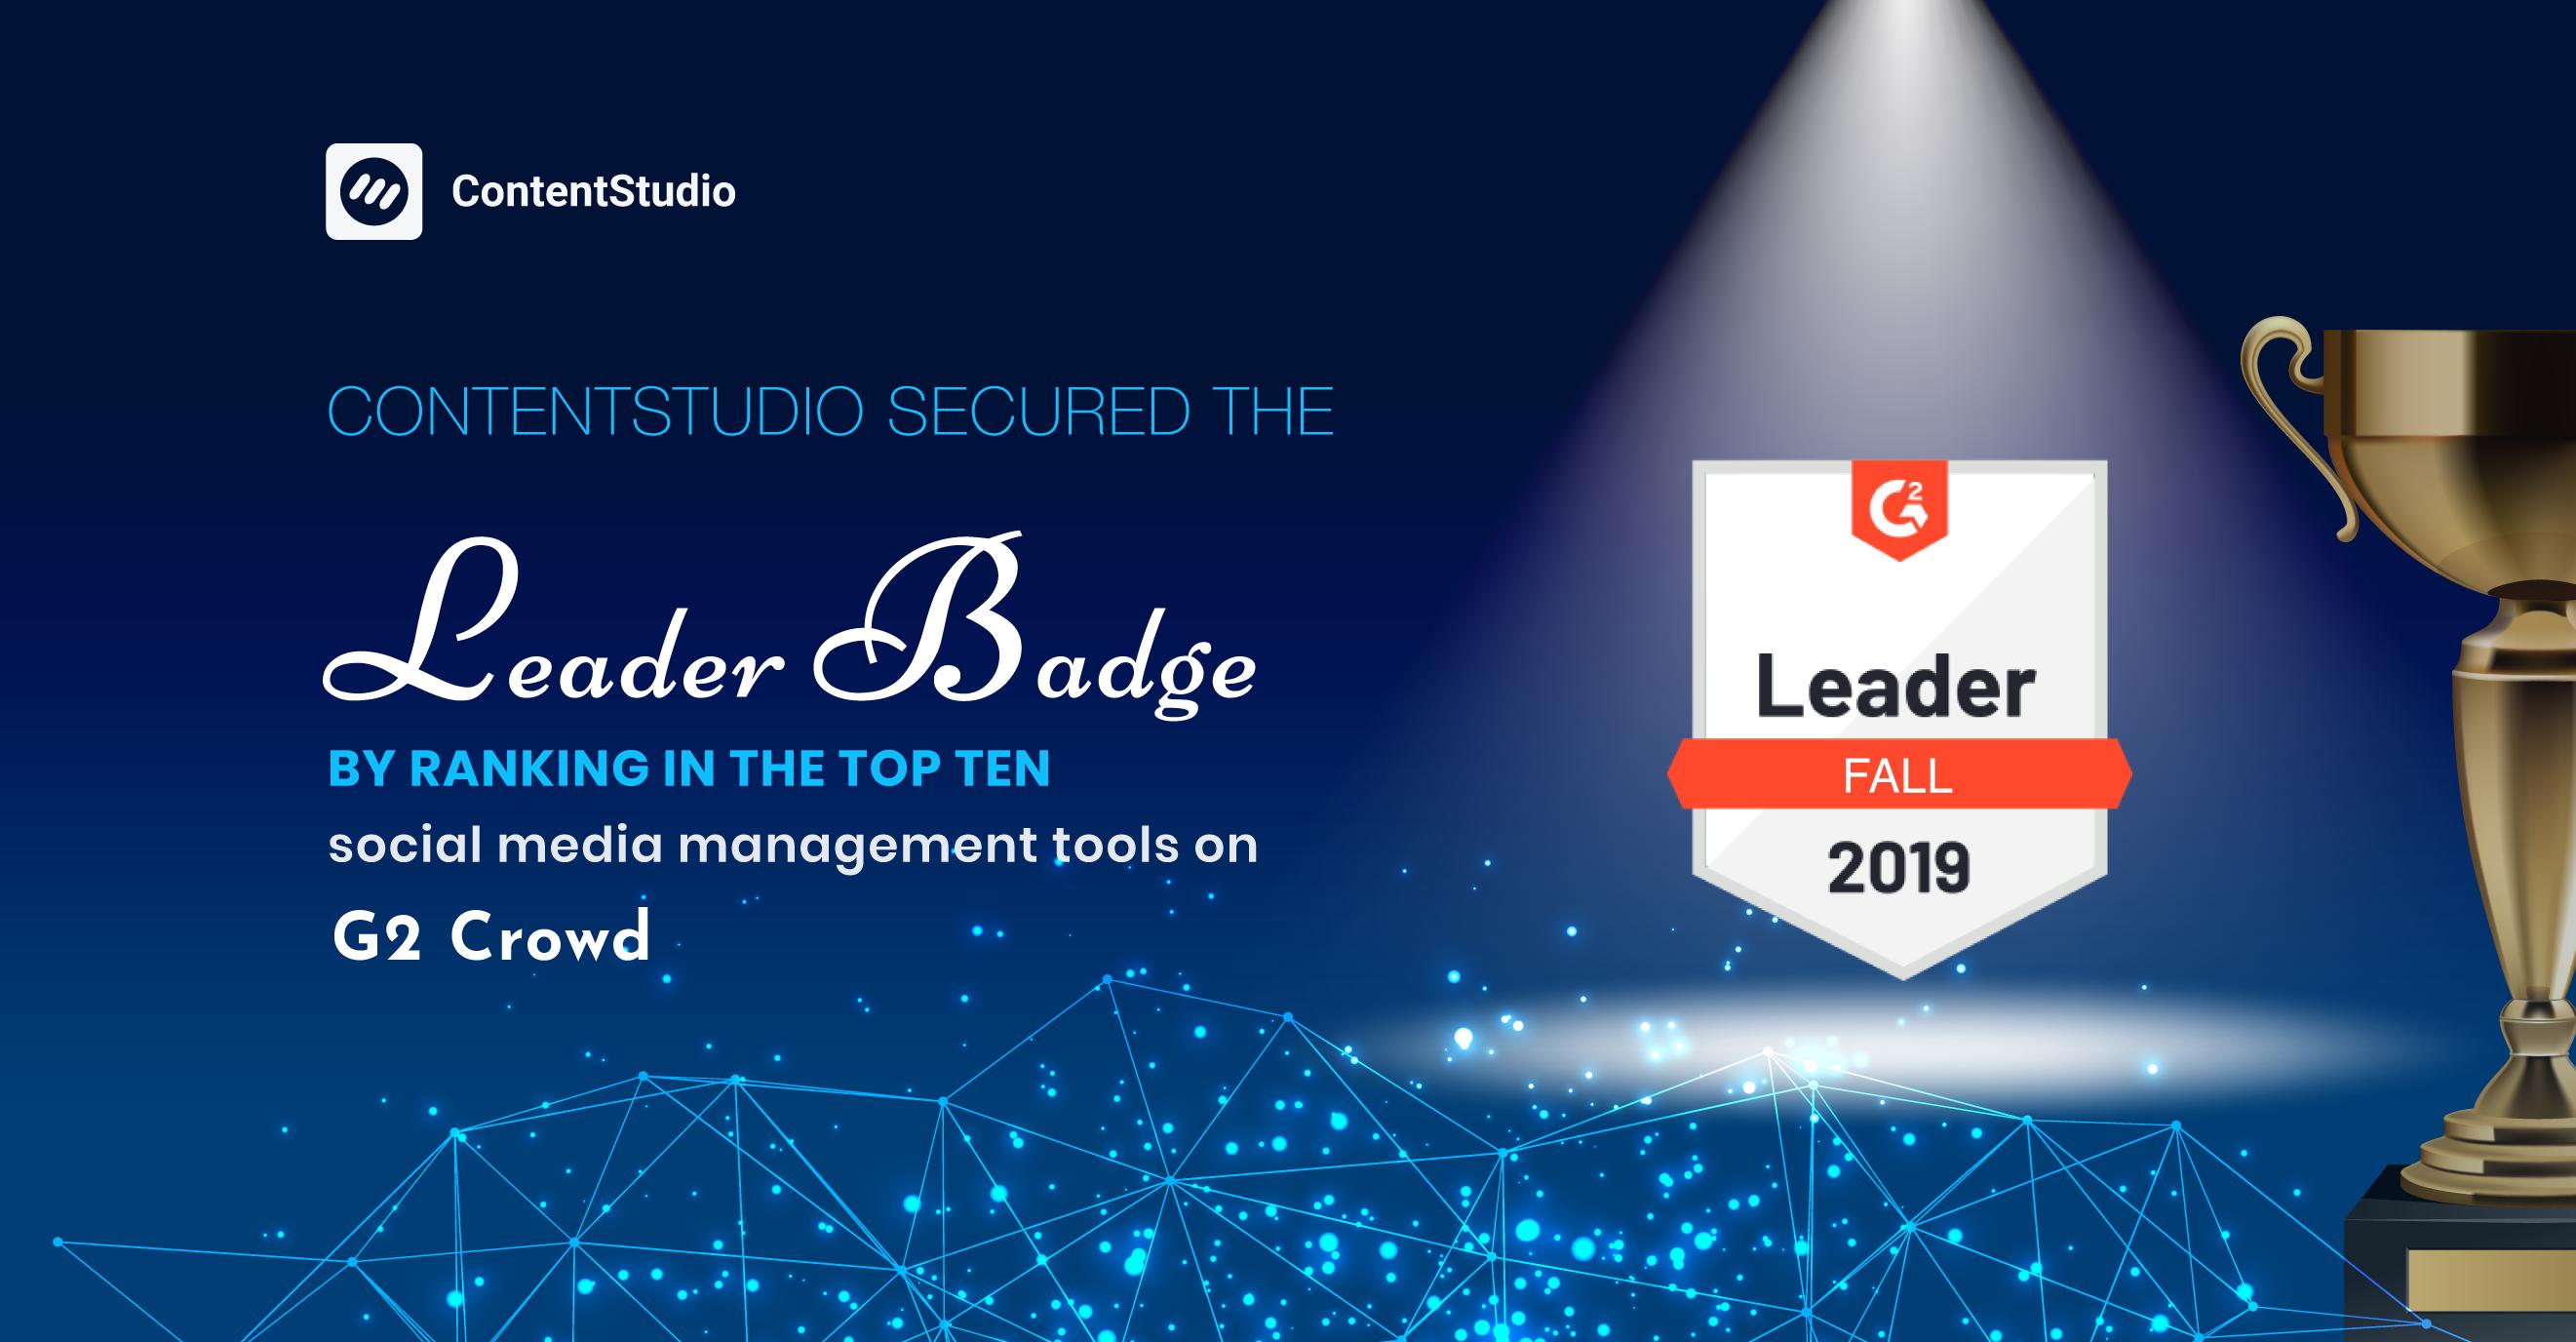 G2 Crowd Leader Award - ContentStudio